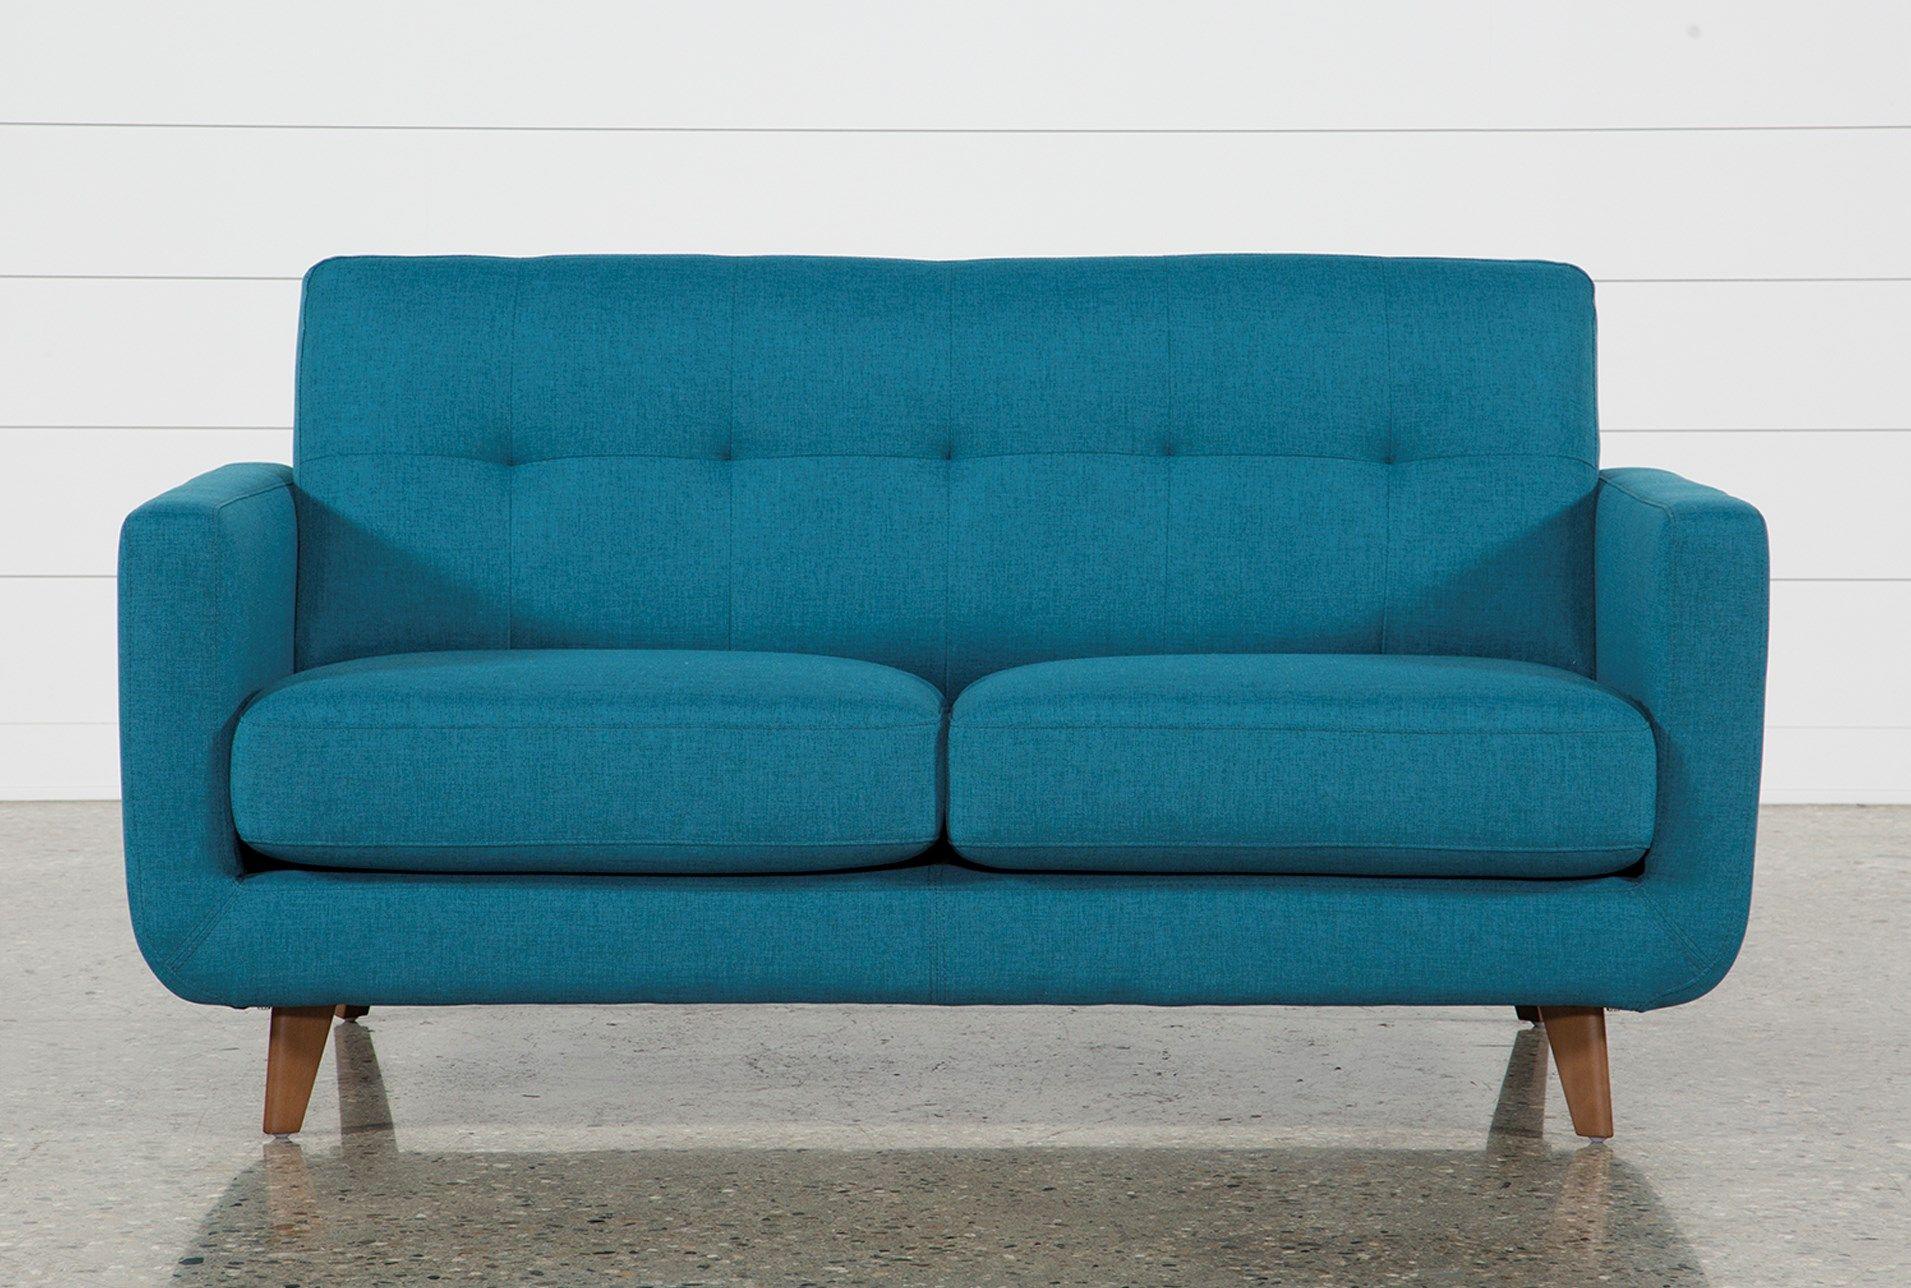 Twin Plus Sleeper Sofa, Allie Jade Blue 650 Sleeper